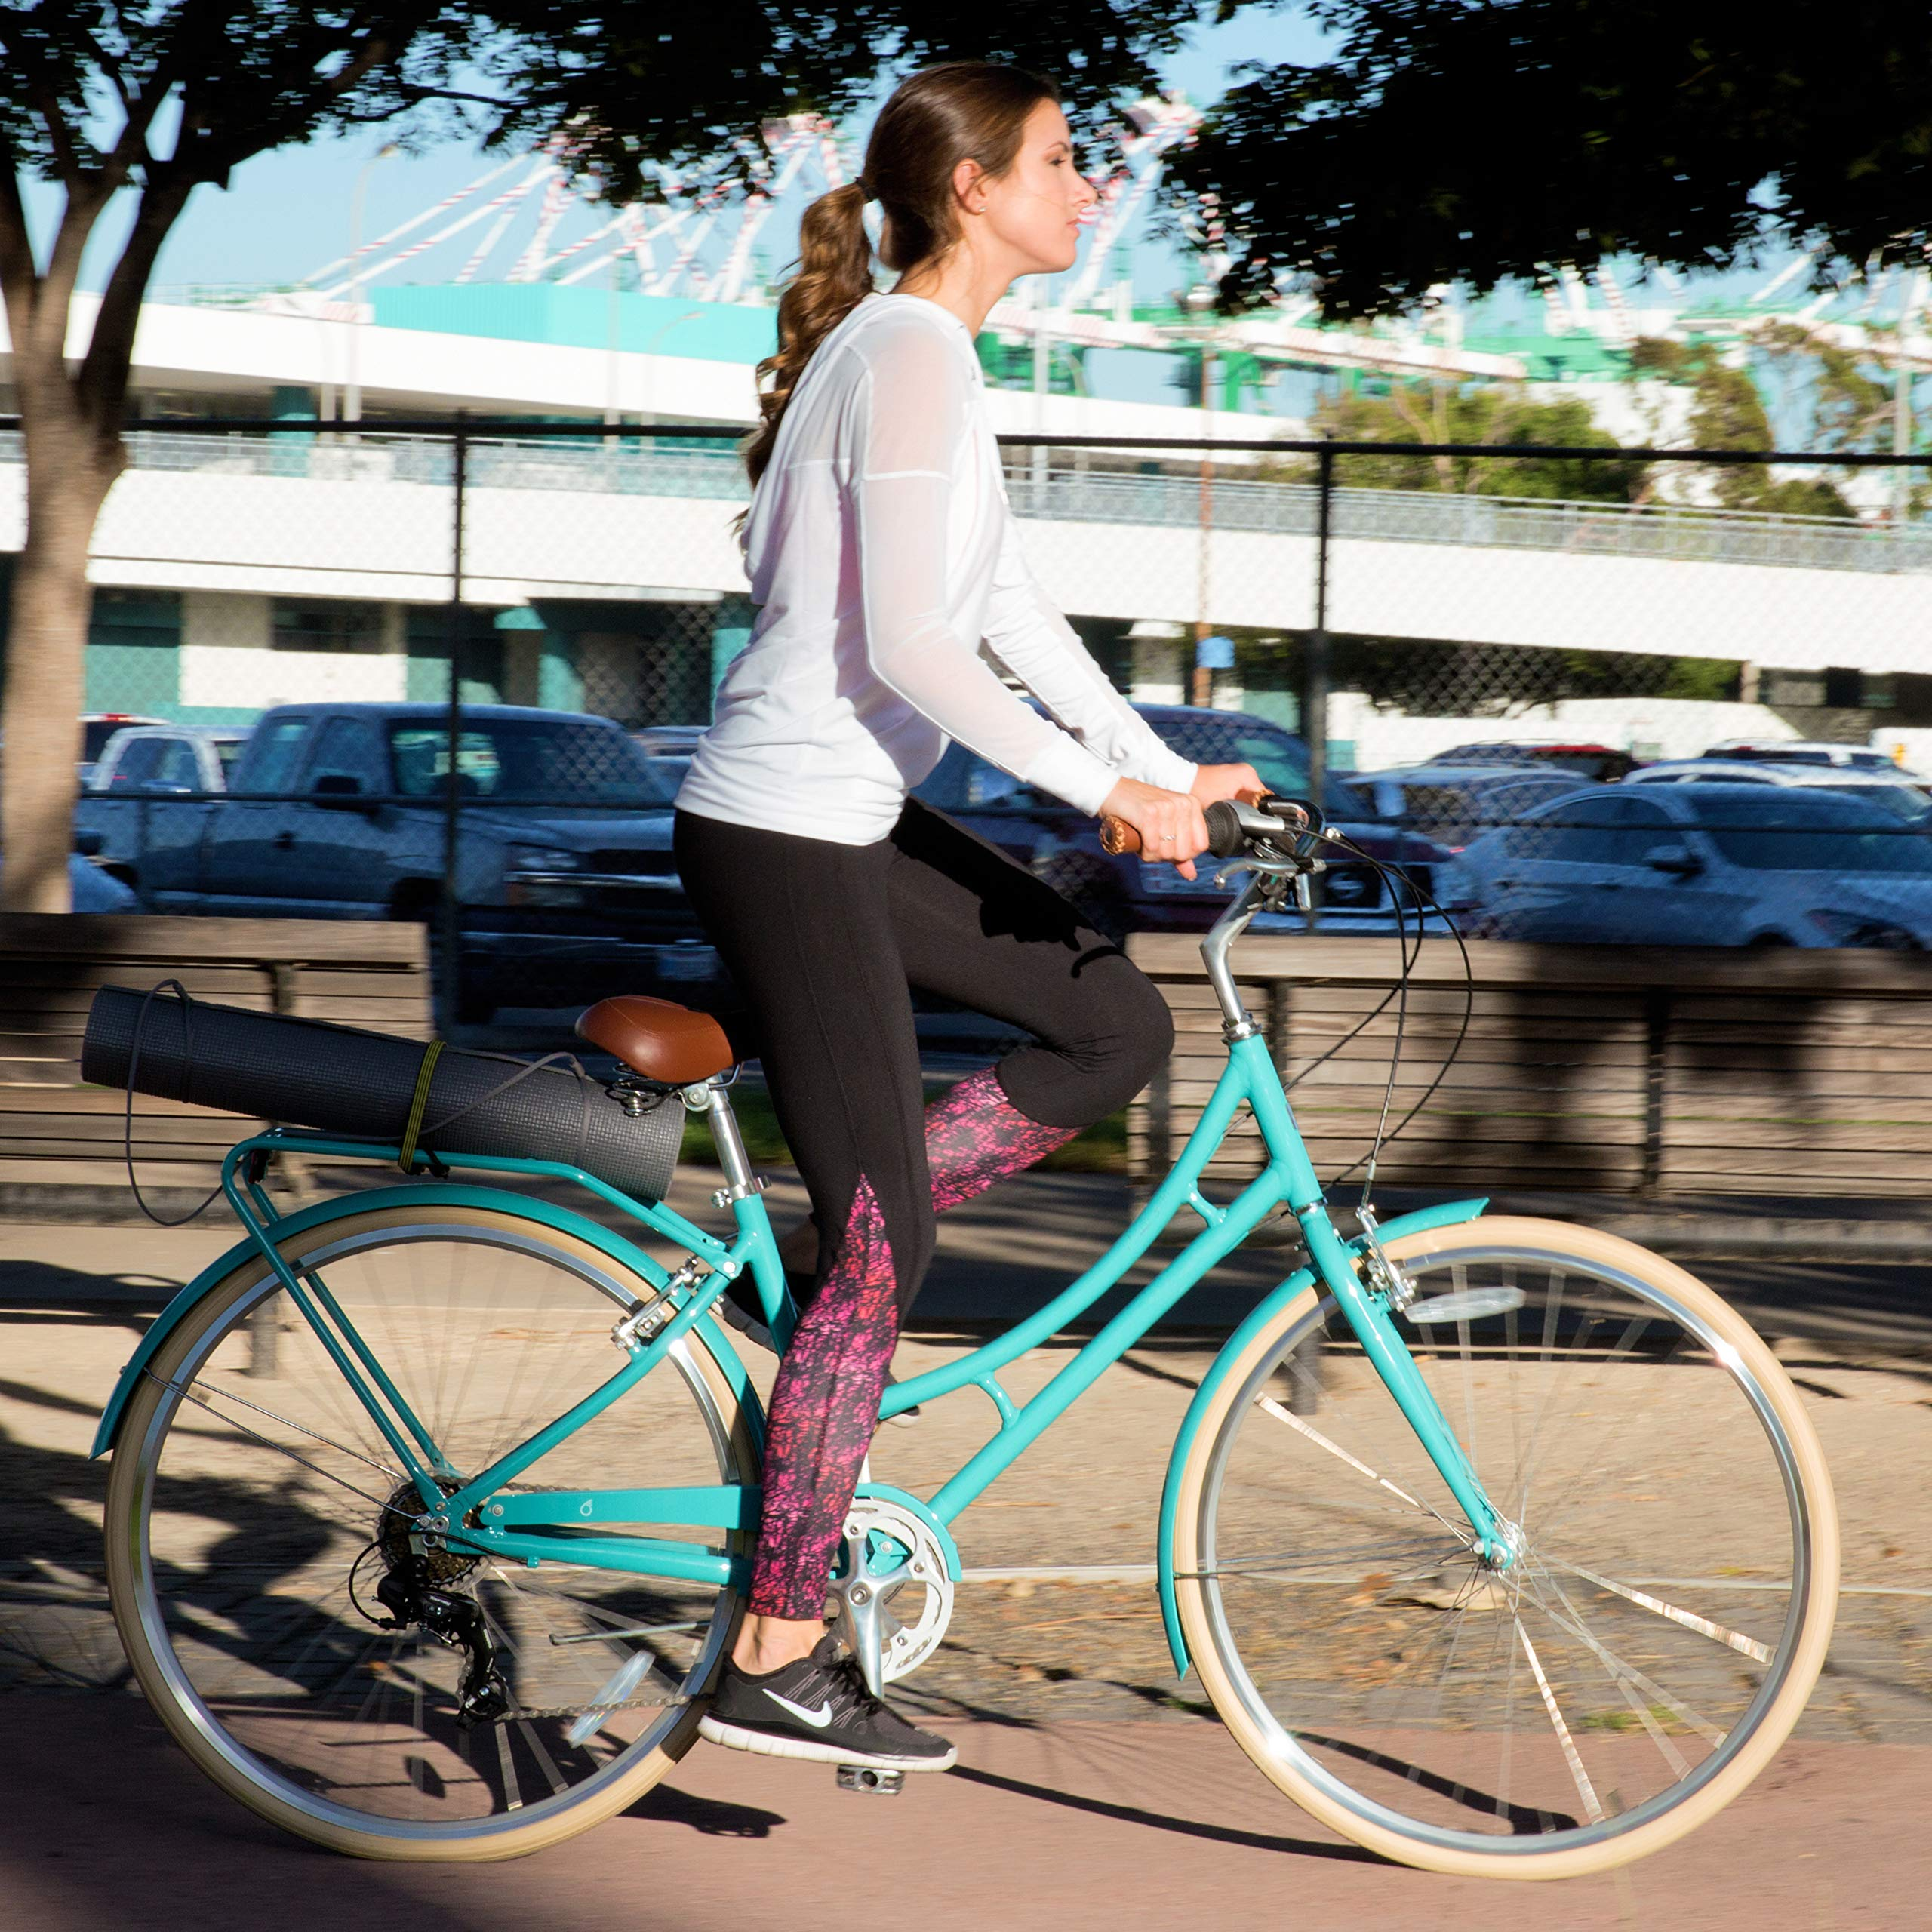 Sixthreezero Ride In The Park Women S Touring City Road